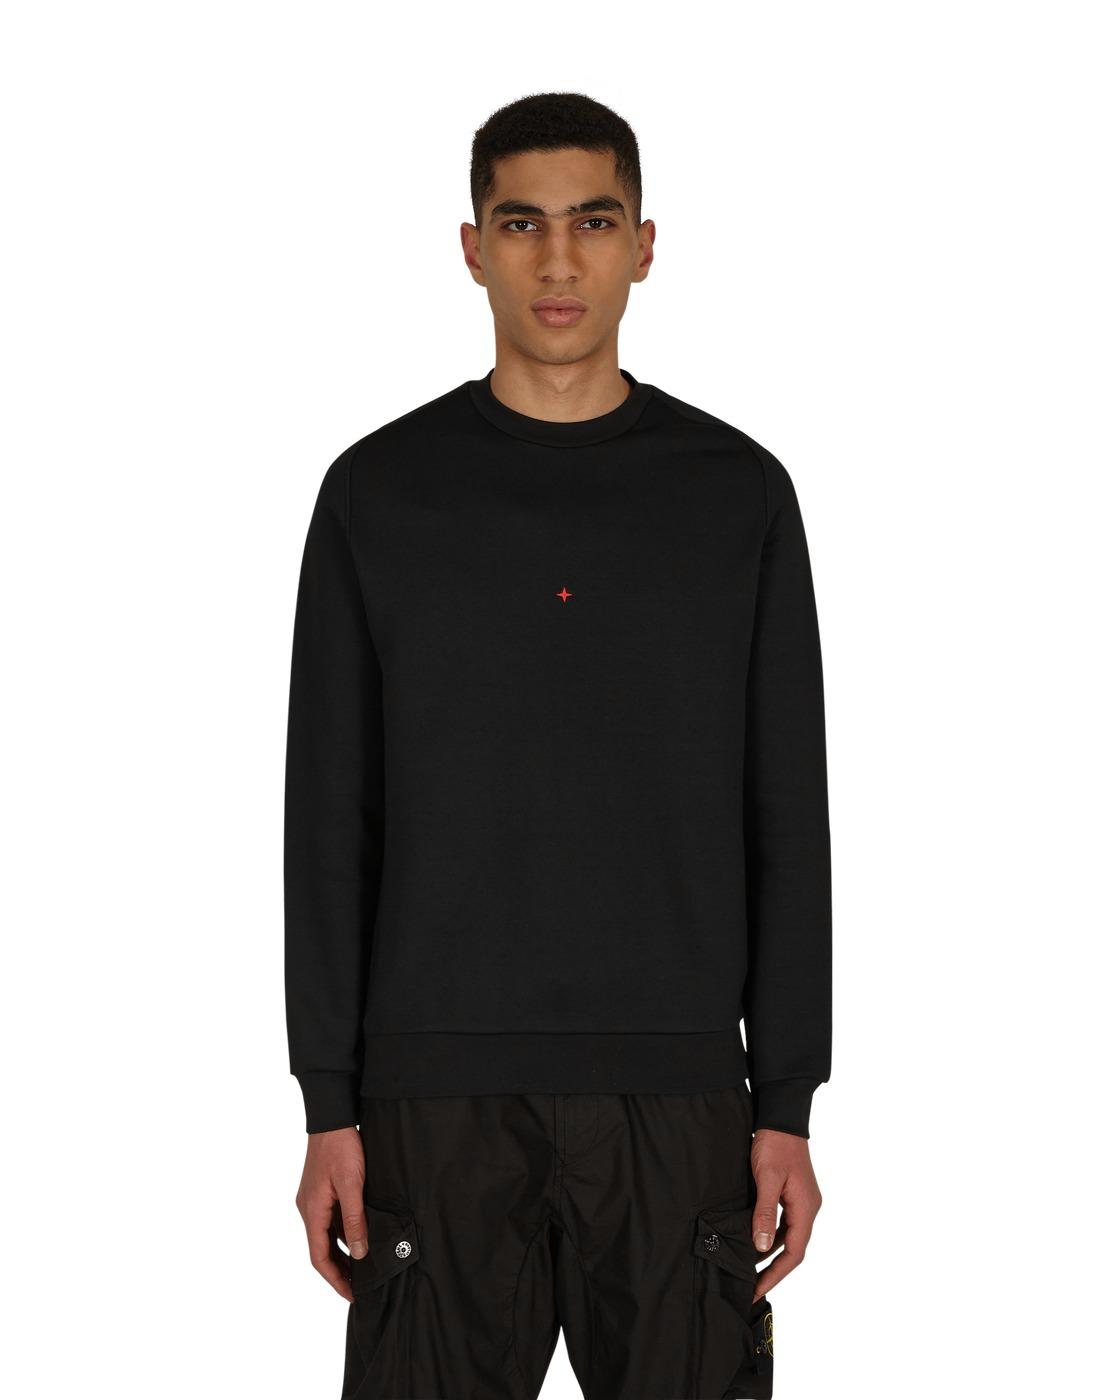 Stone Island Marina Crewneck Sweatshirt Black